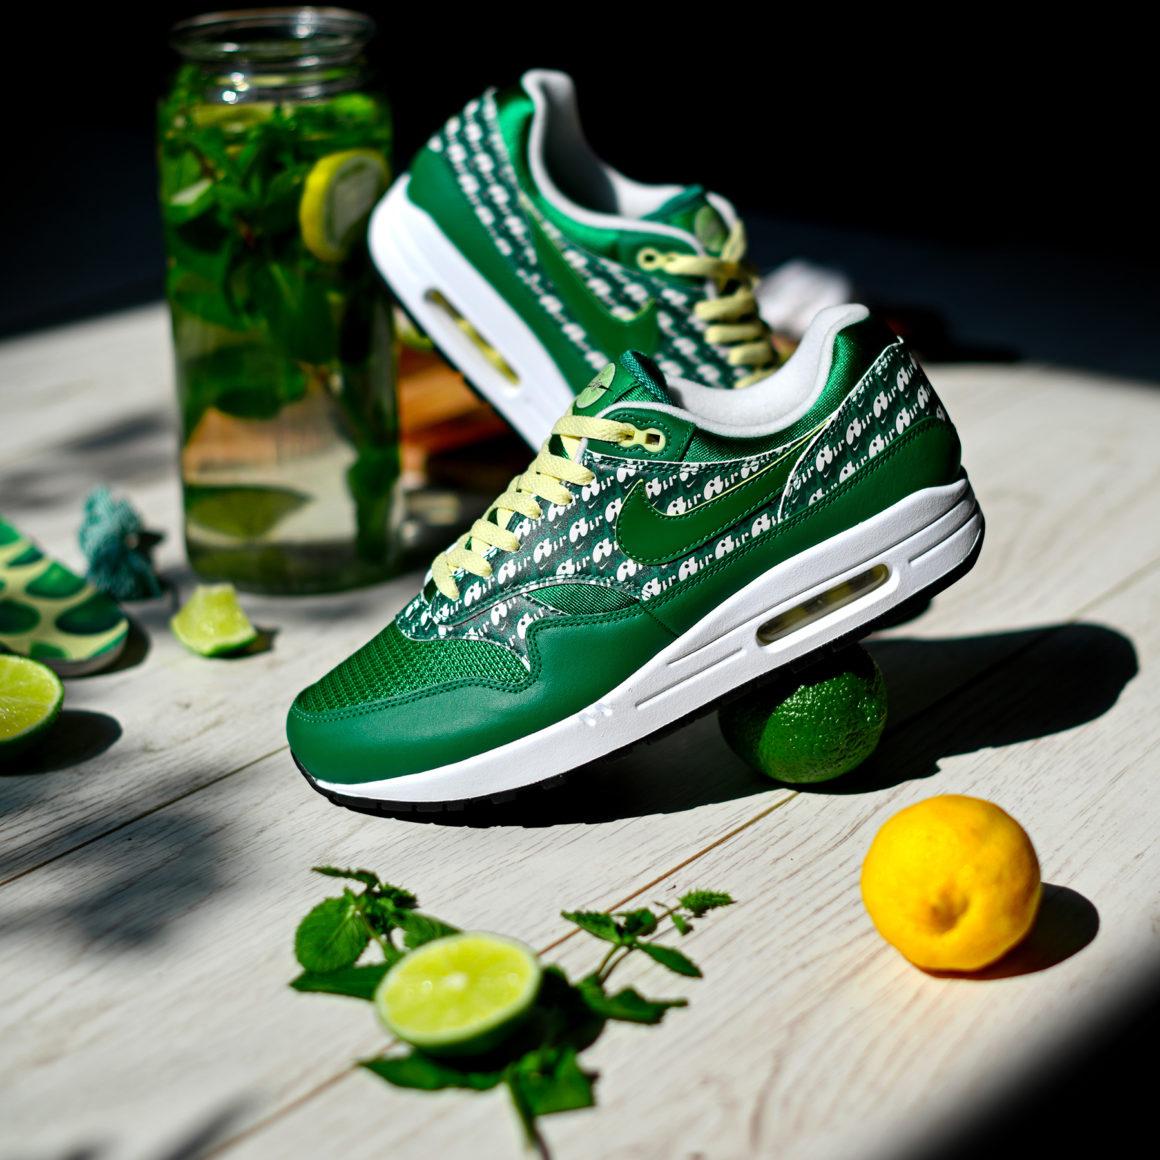 Nike Air Max 1 Limeade Green - Sneakers.fr